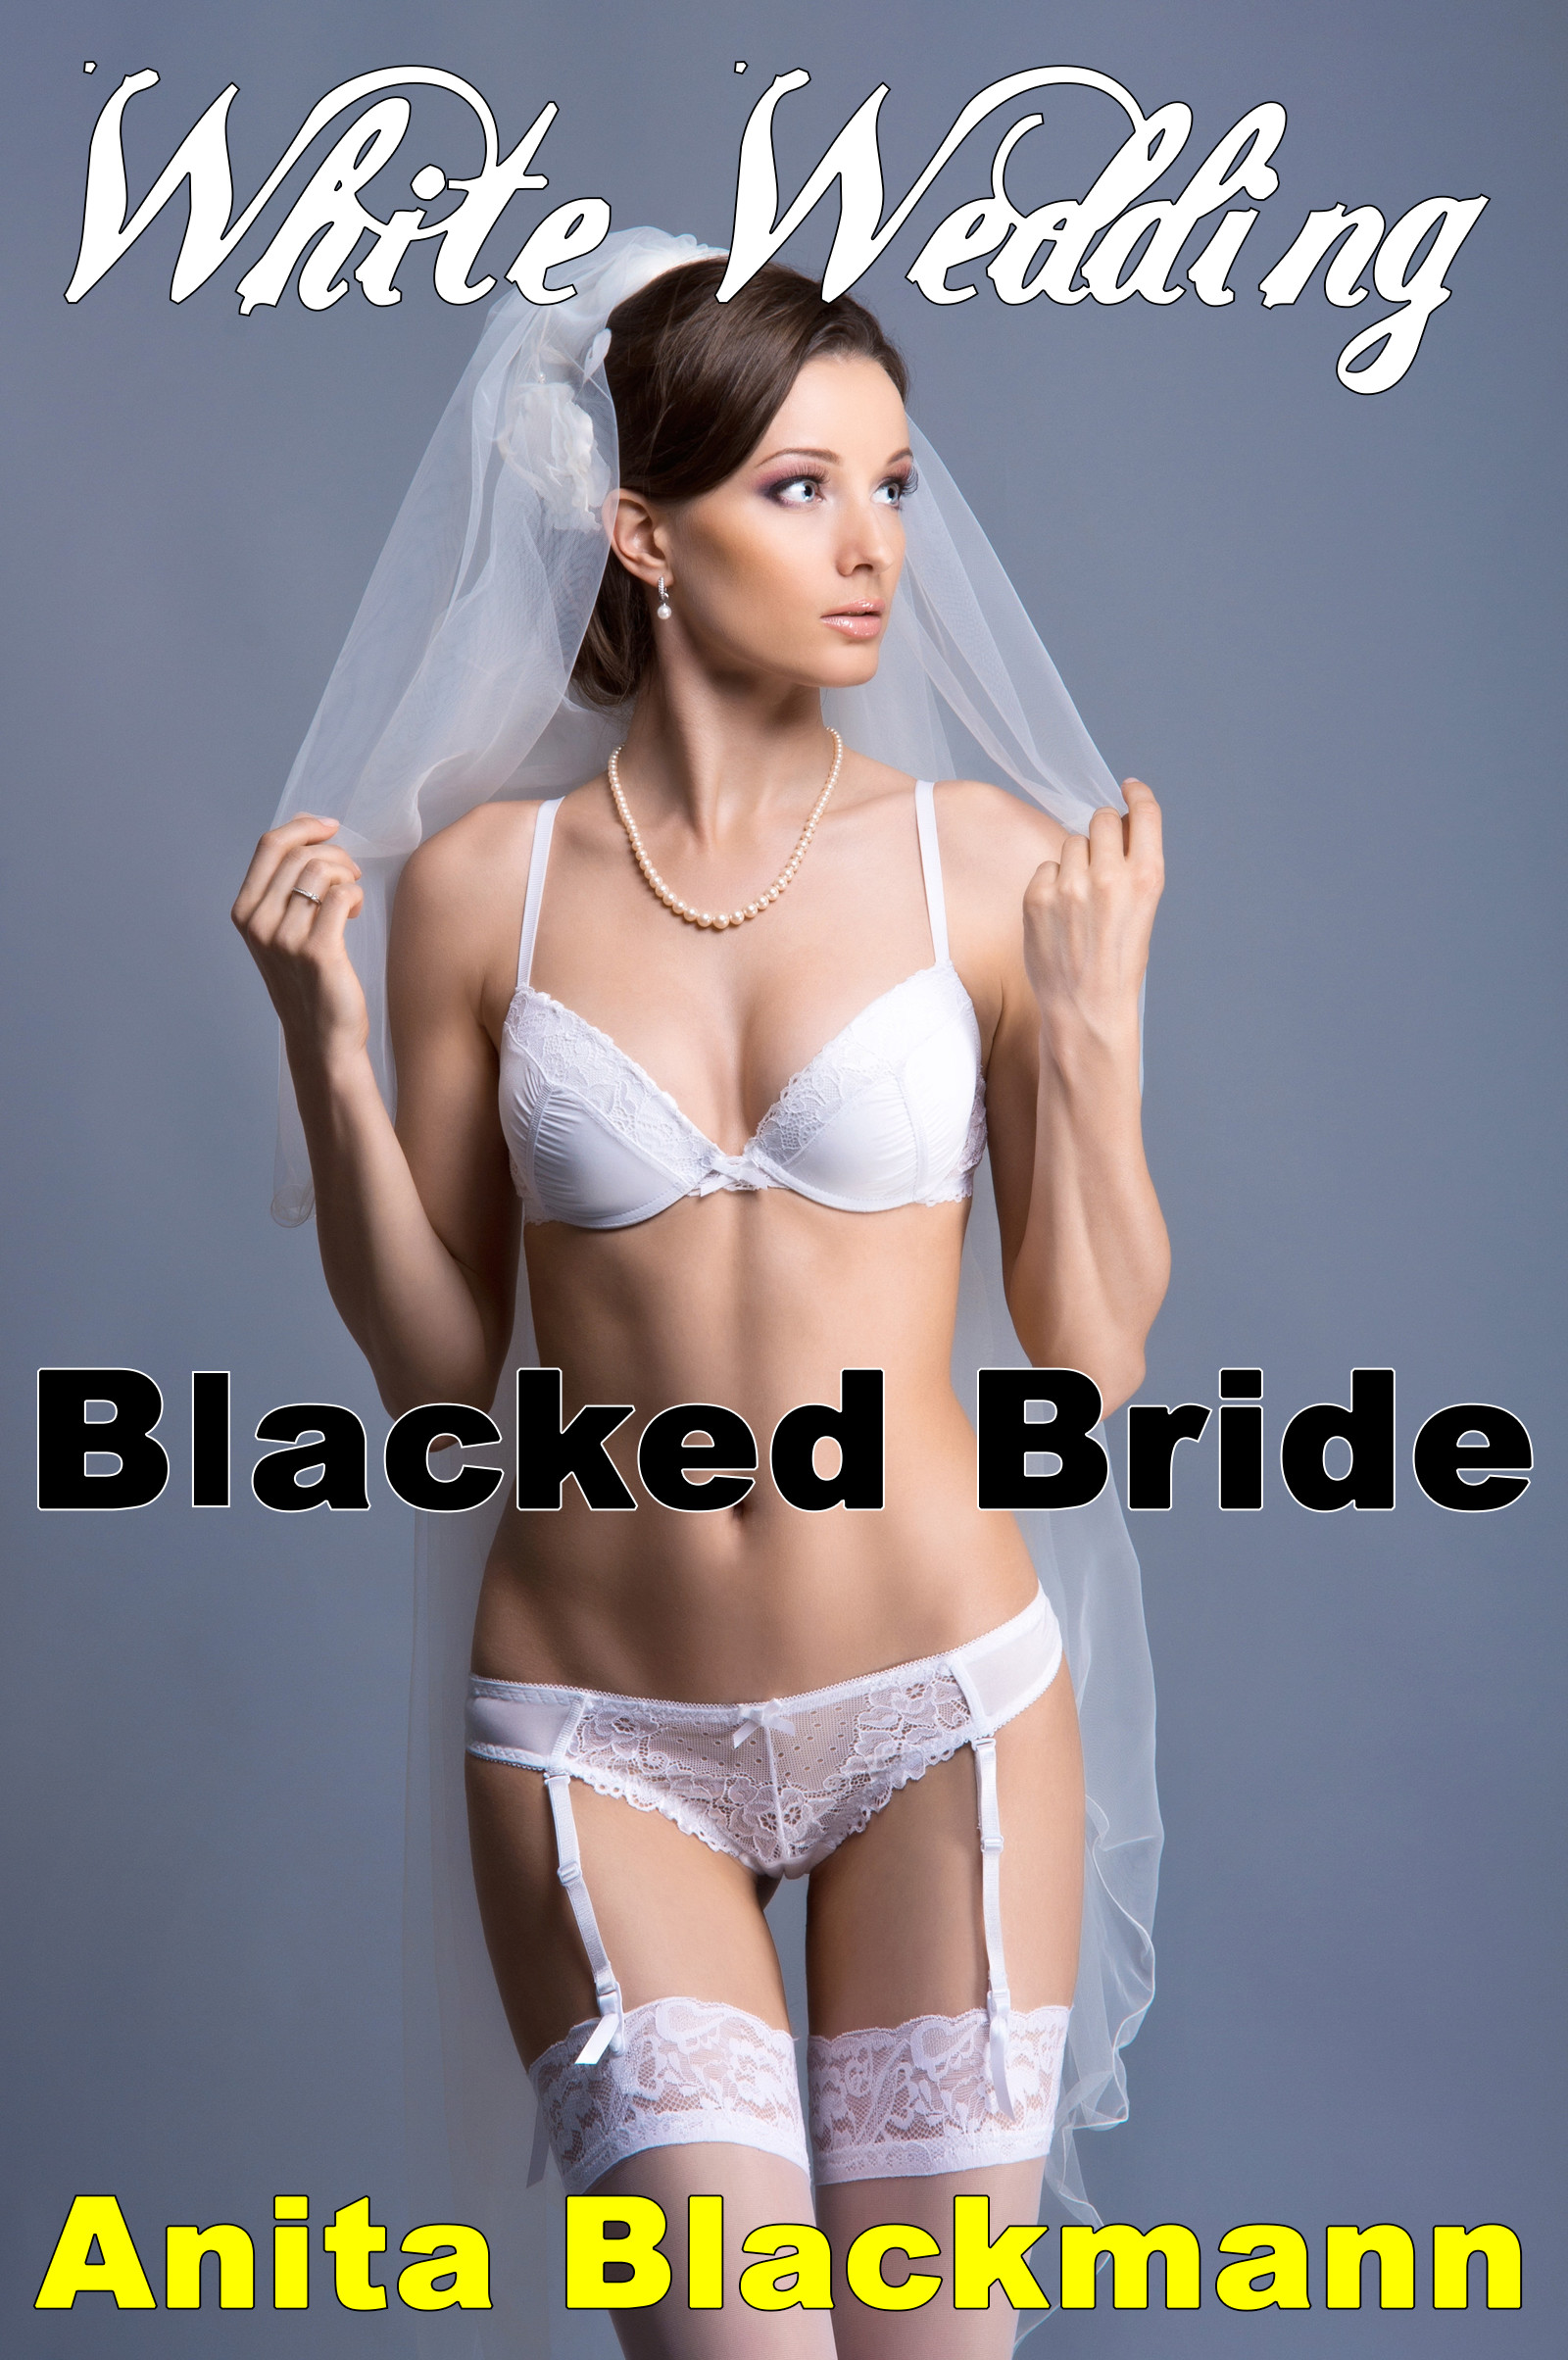 Interracial Cuckold Wedding Minimalist smashwords – white wedding, blacked bride honeymoon: an